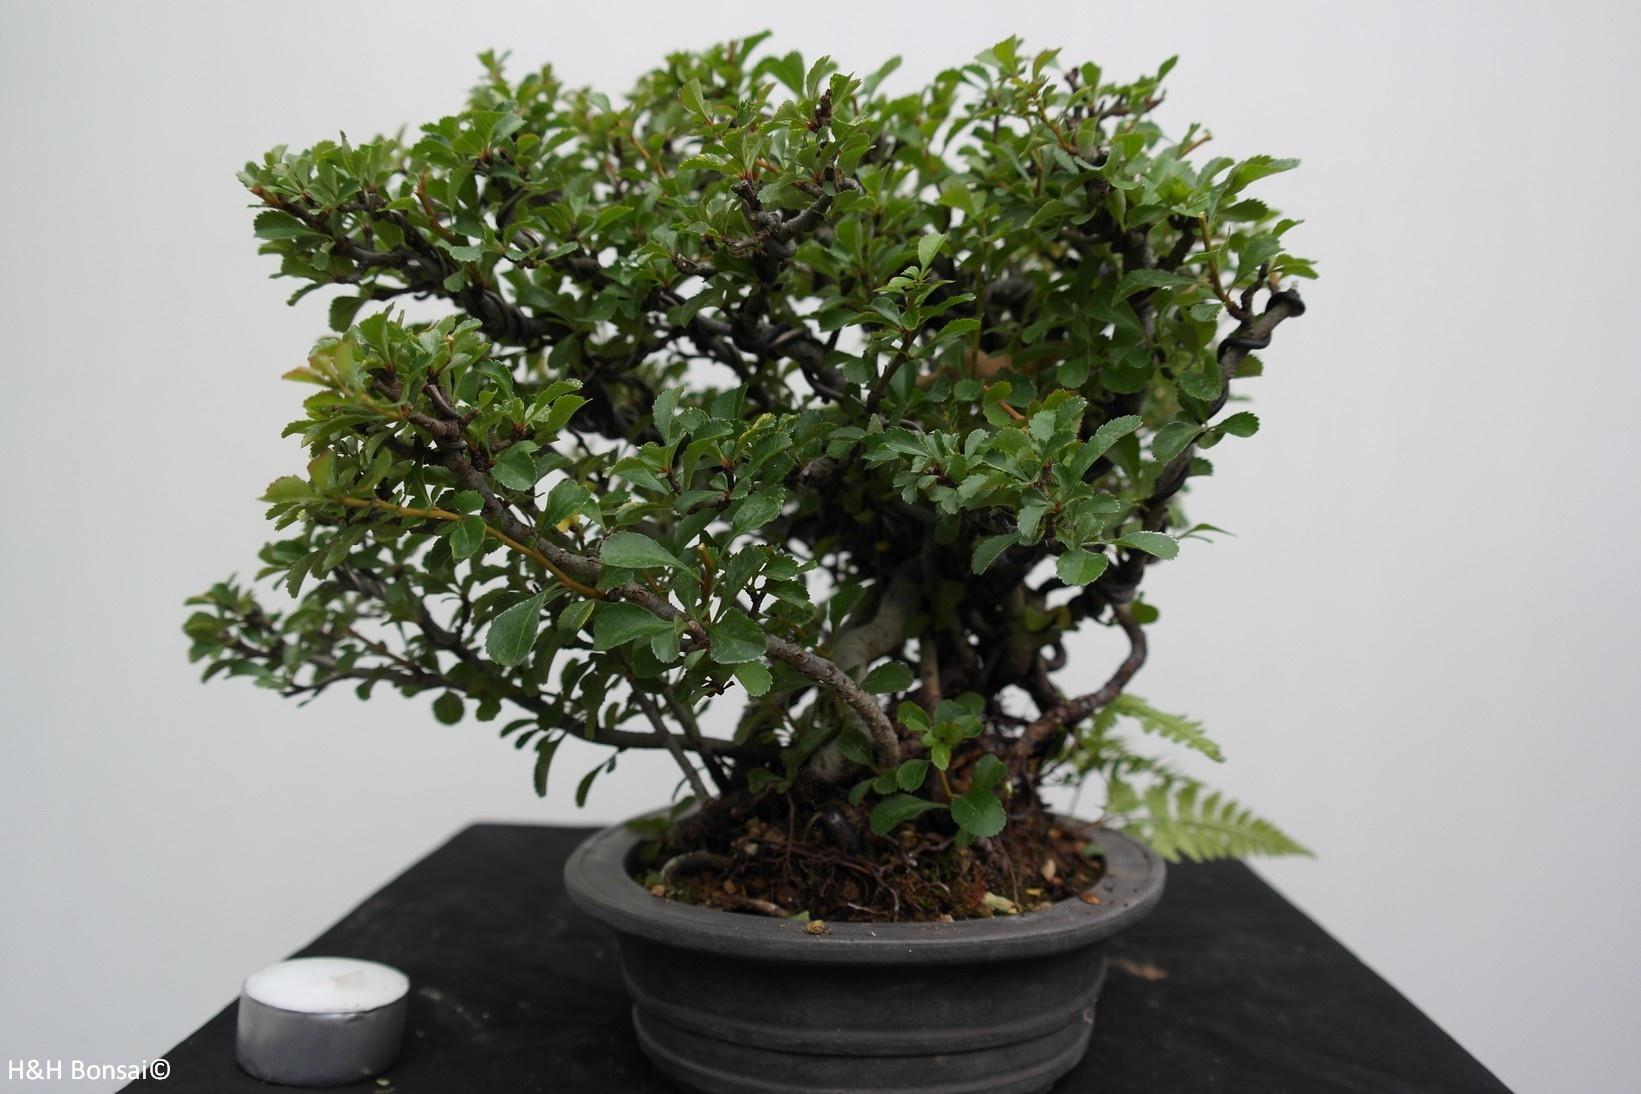 Bonsai Chaenomeles japonica, Japanse sierkwee, nr. 7796